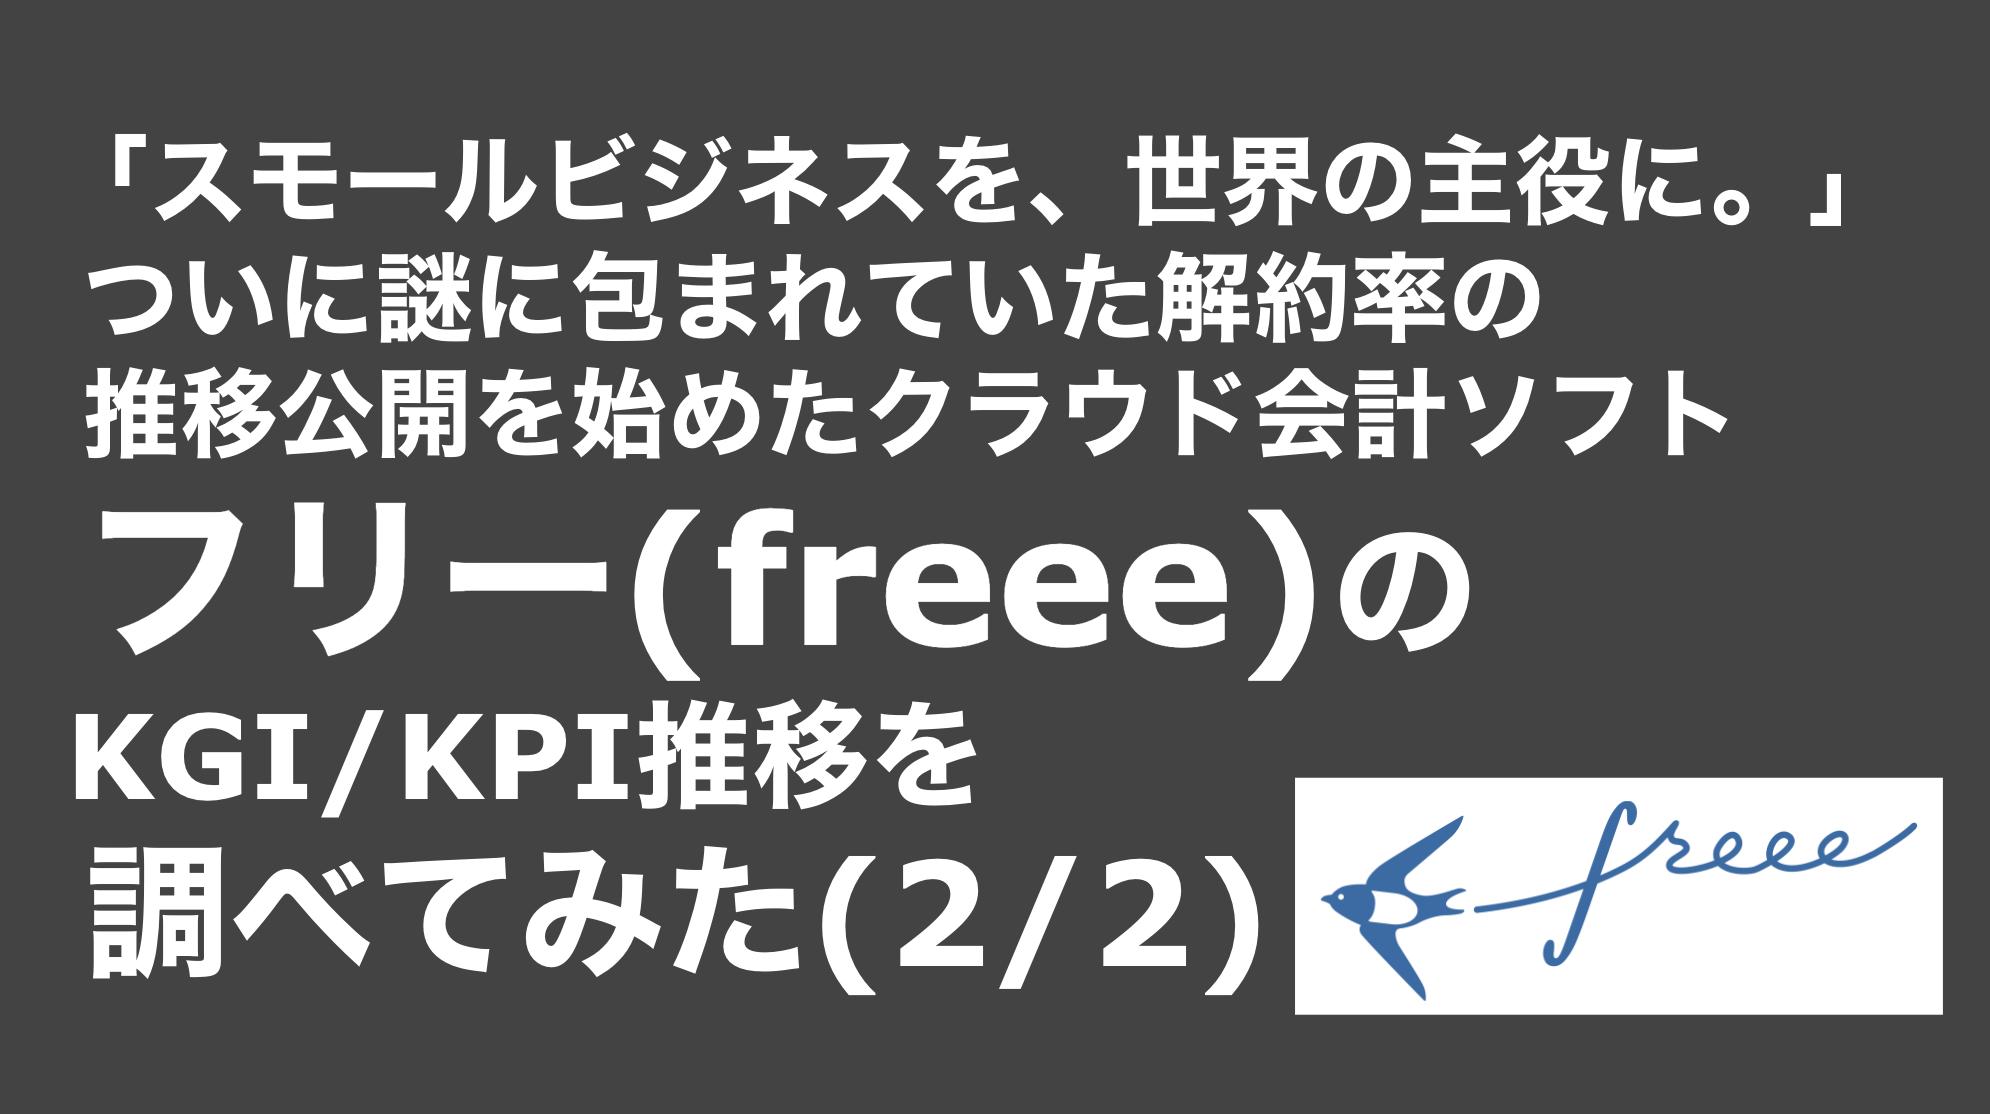 saaslife_「スモールビジネスを、世界の主役に。」ついに謎に包まれていた解約率の推移公開を始めたクラウド会計ソフトフリー(freee)のKGI/KPI推移を調べてみた(2/2)